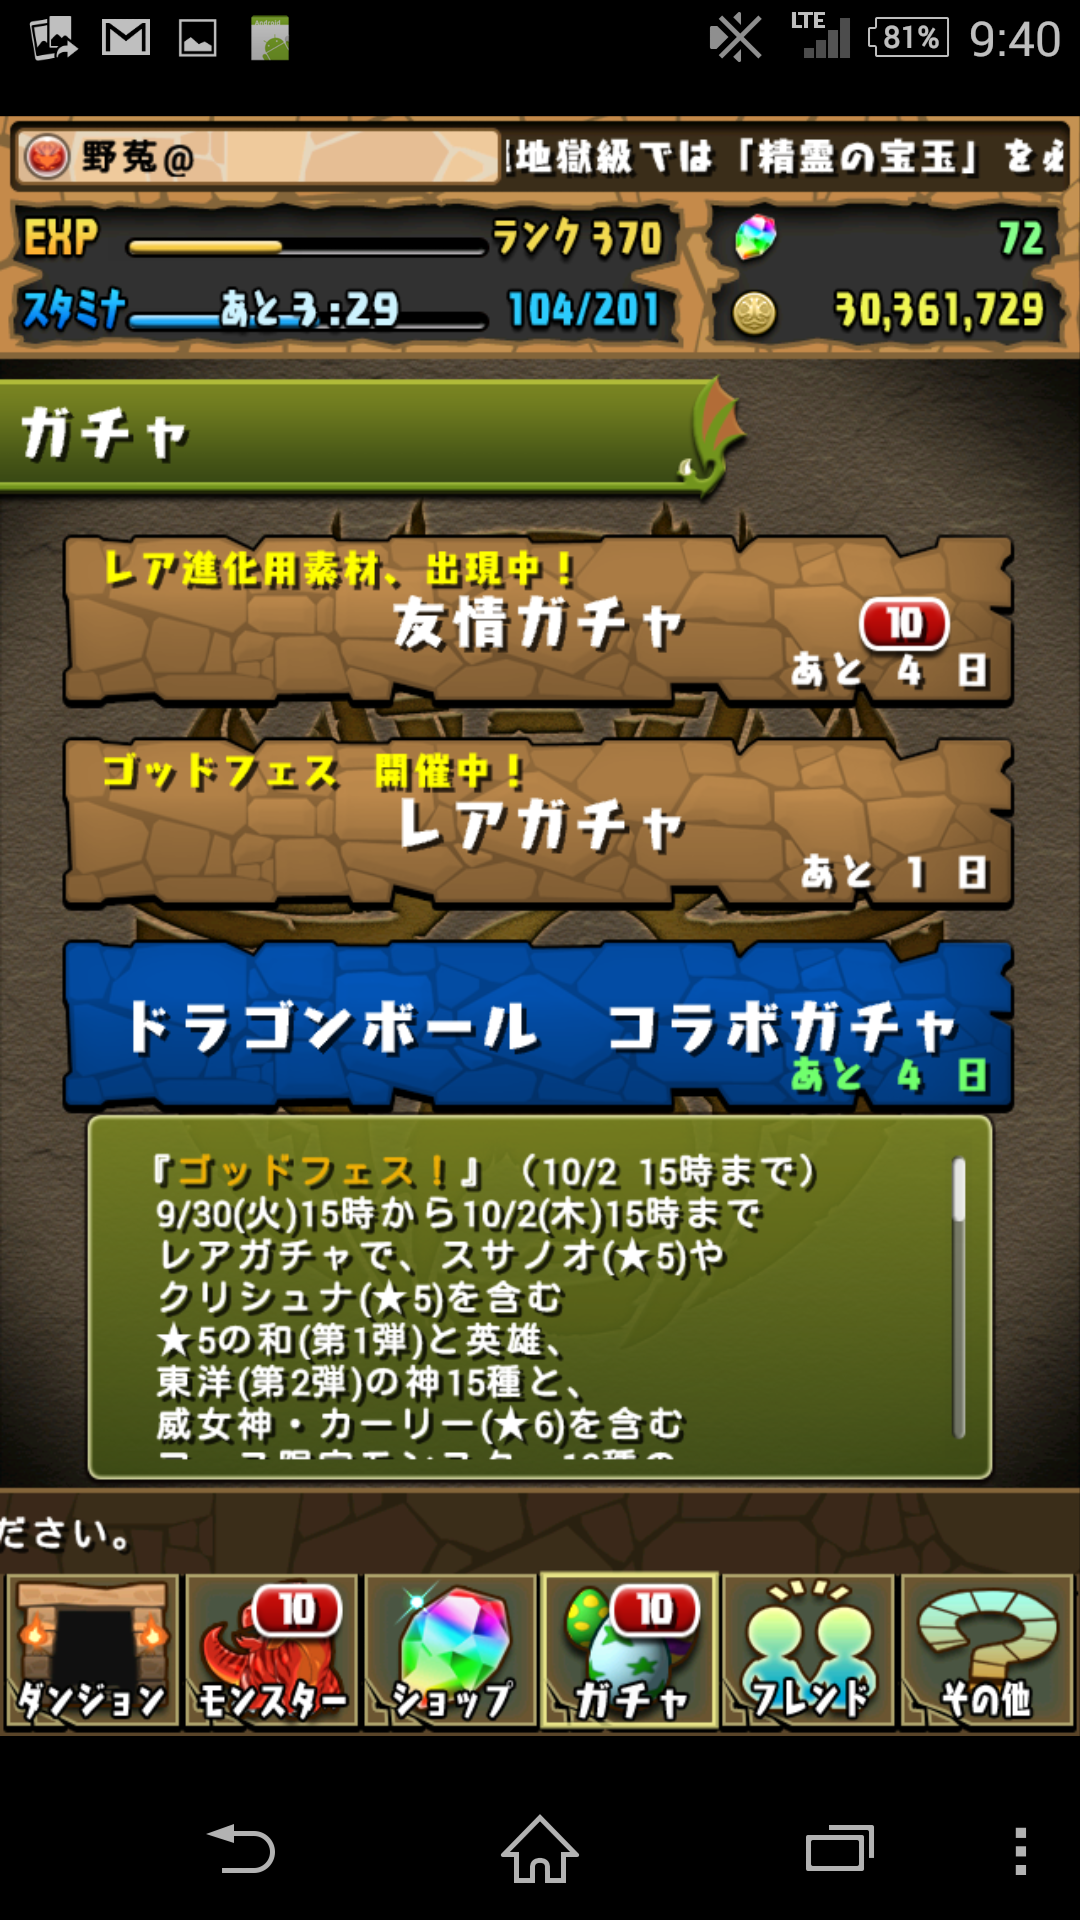 Screenshot_2014-10-01-09-40-21.png